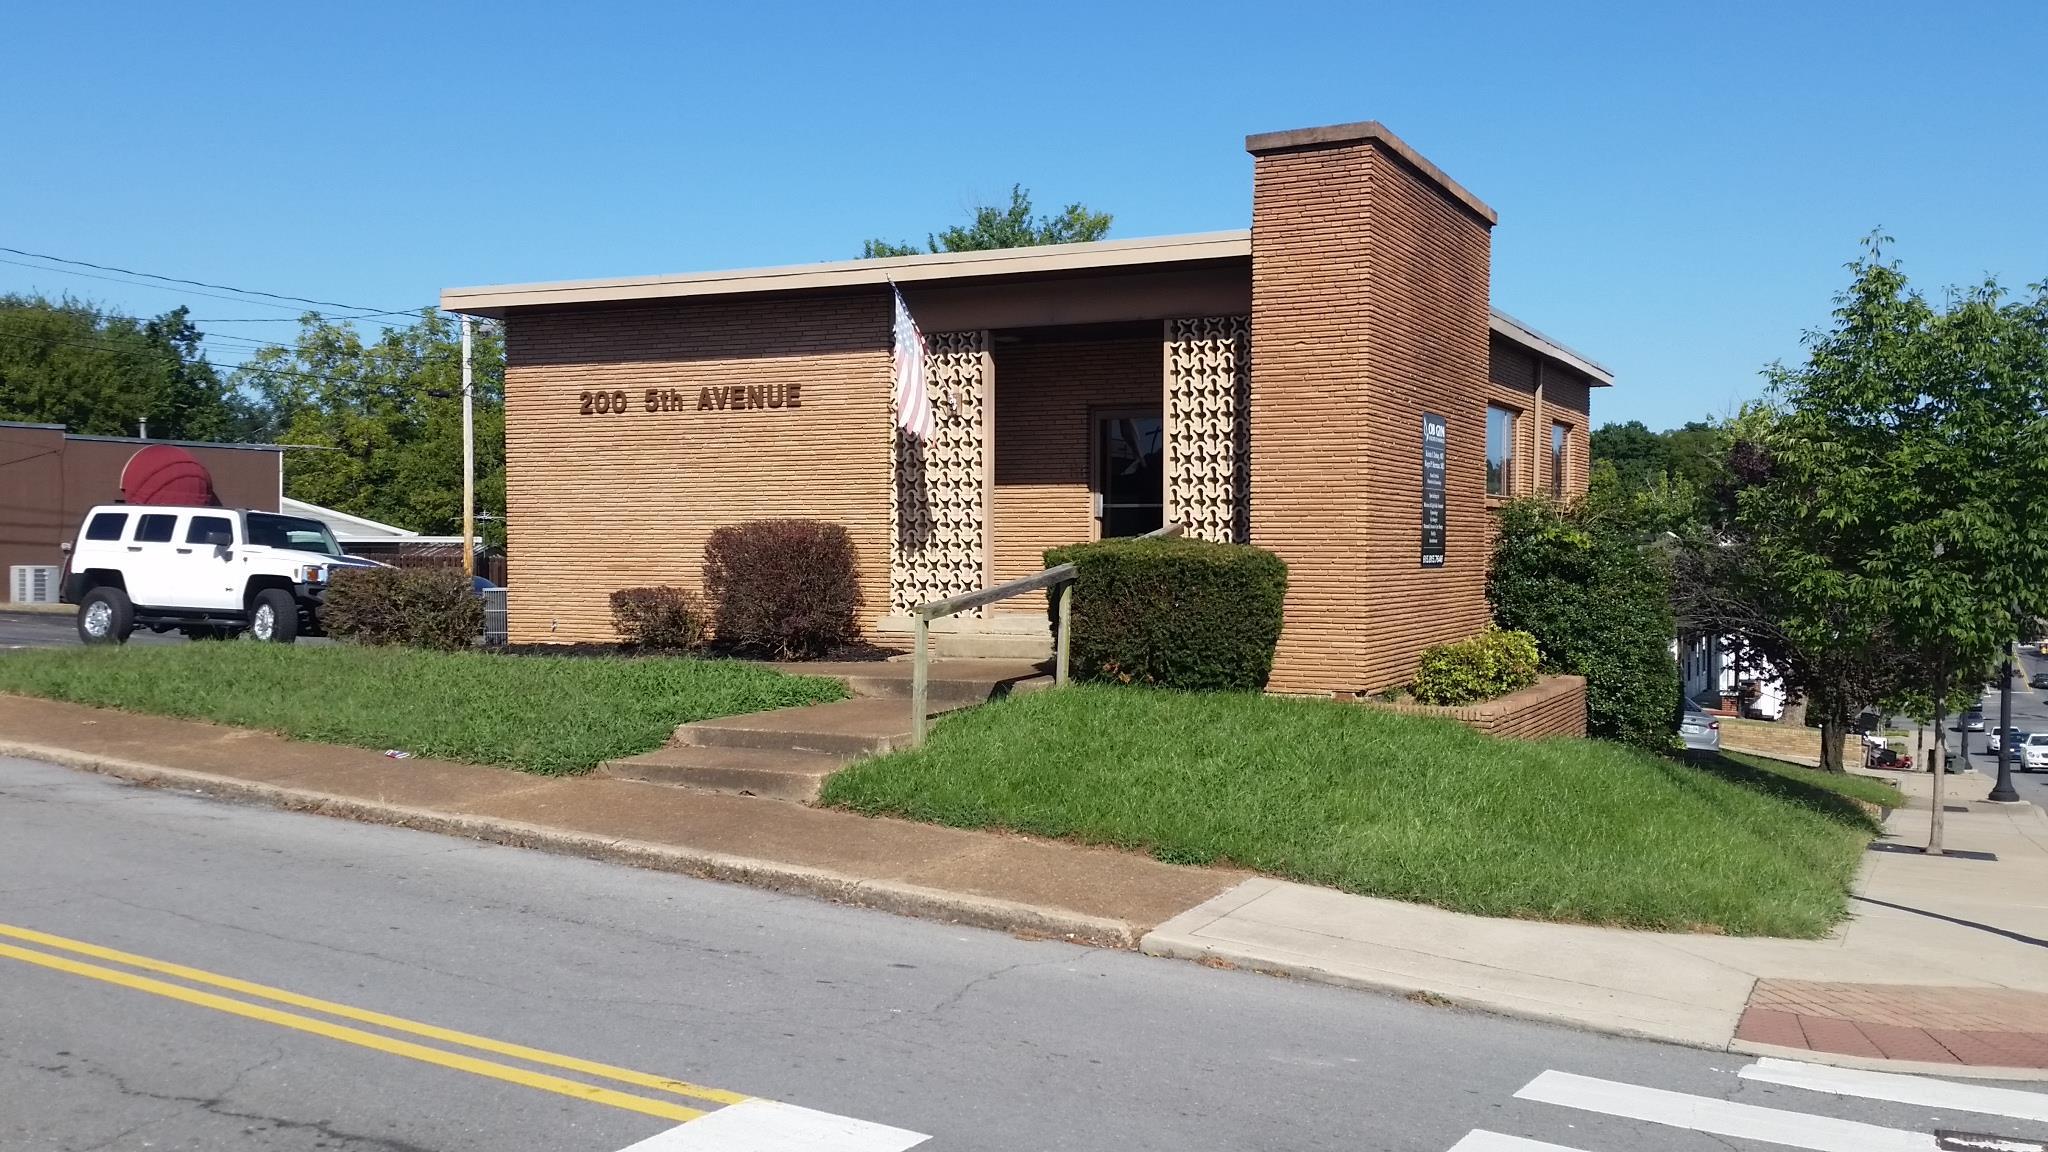 200 5th Ave E, Springfield, TN 37172